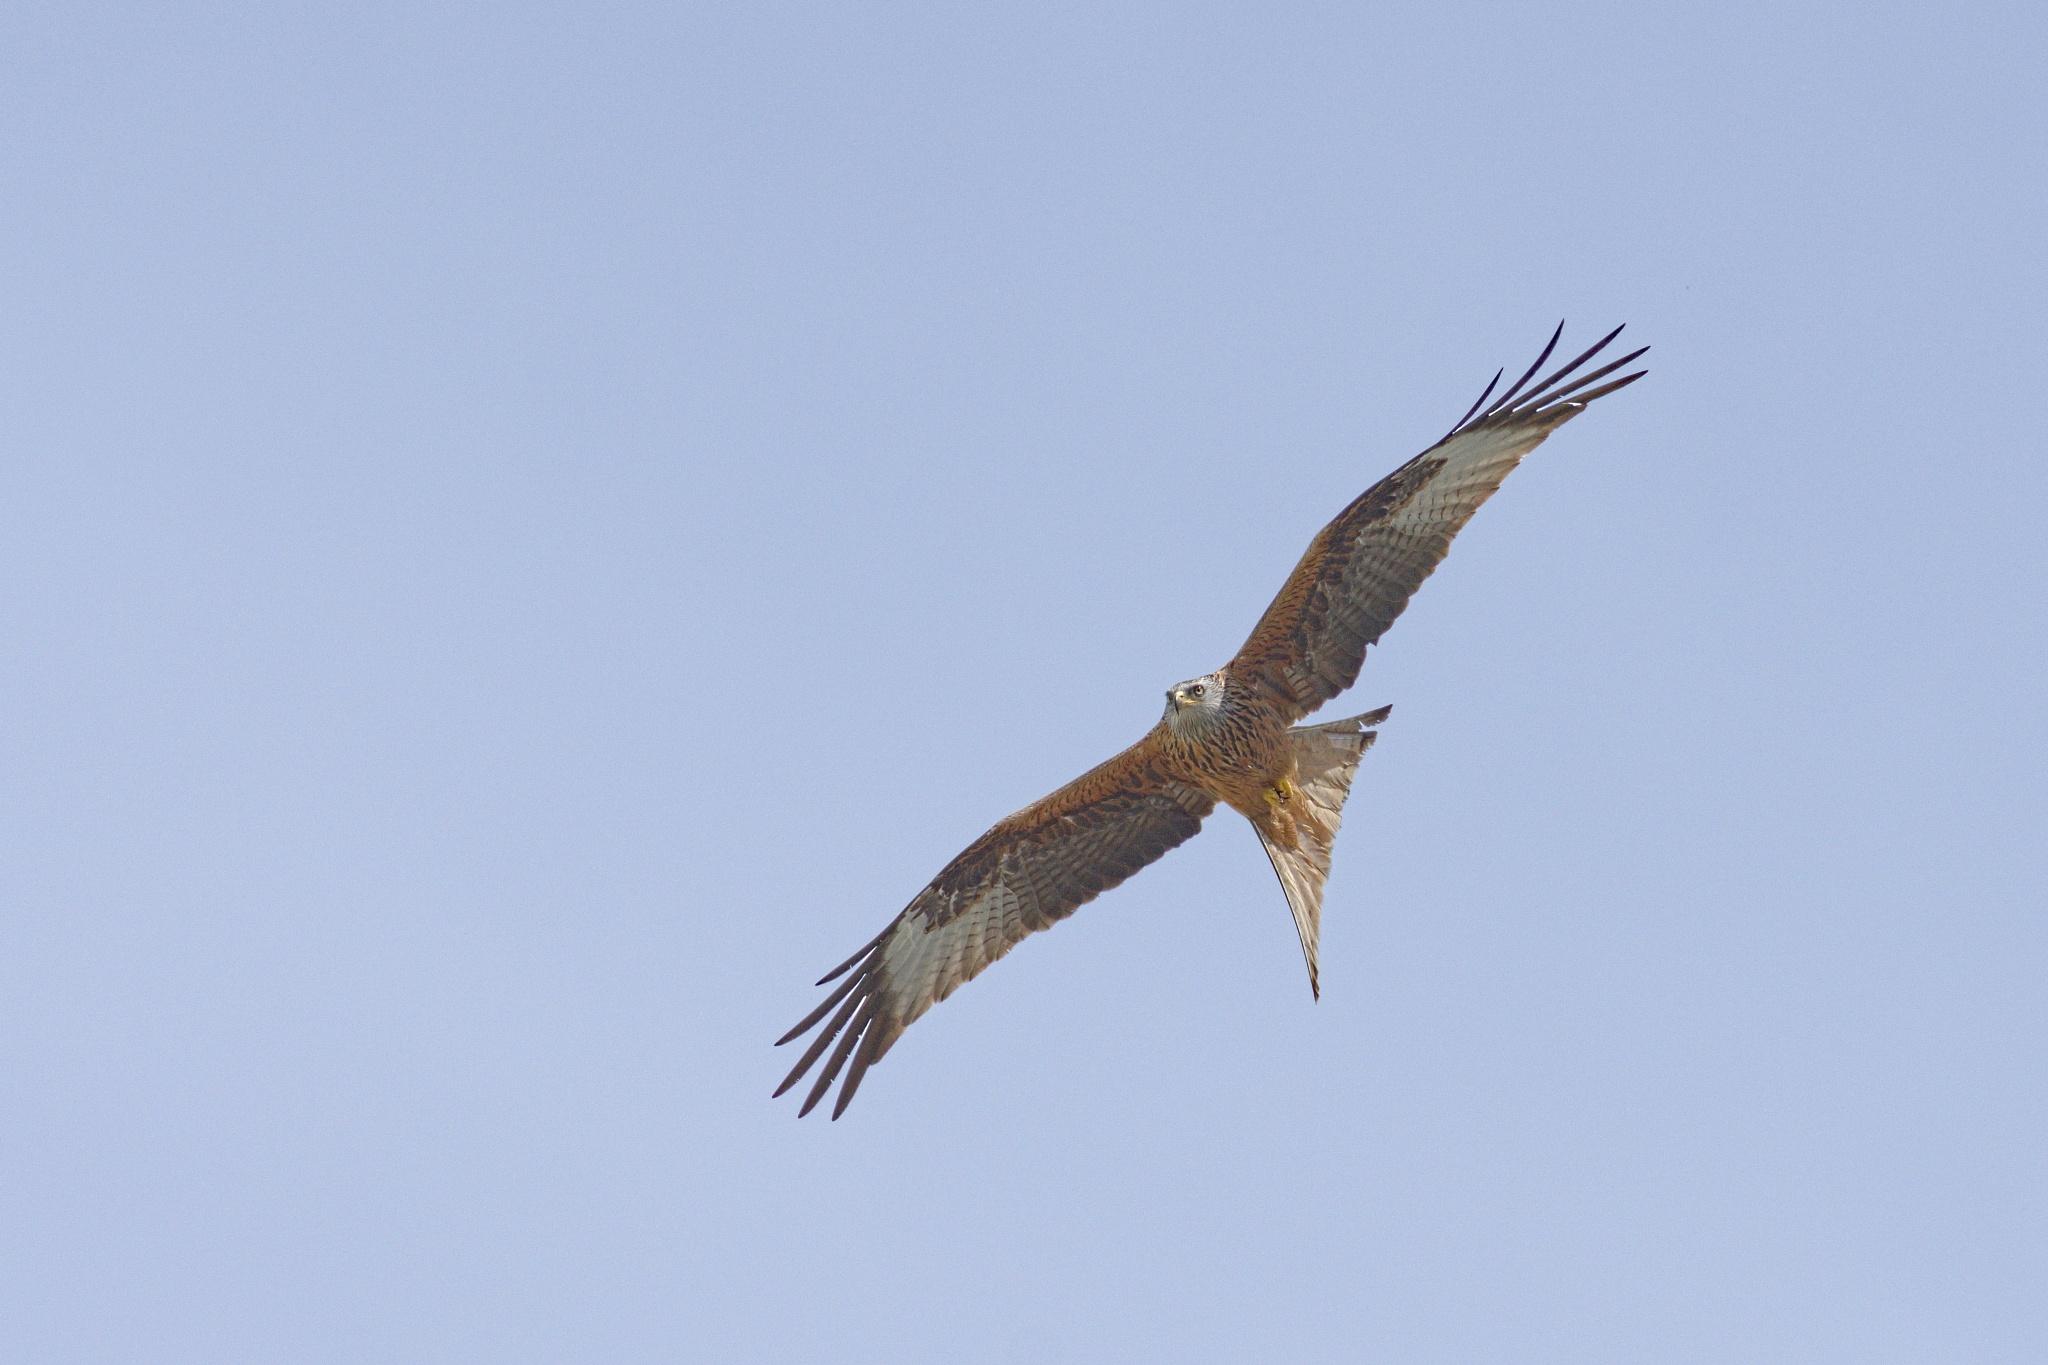 Milvus milvus (red kite) by Emiliani Spinelli Diego